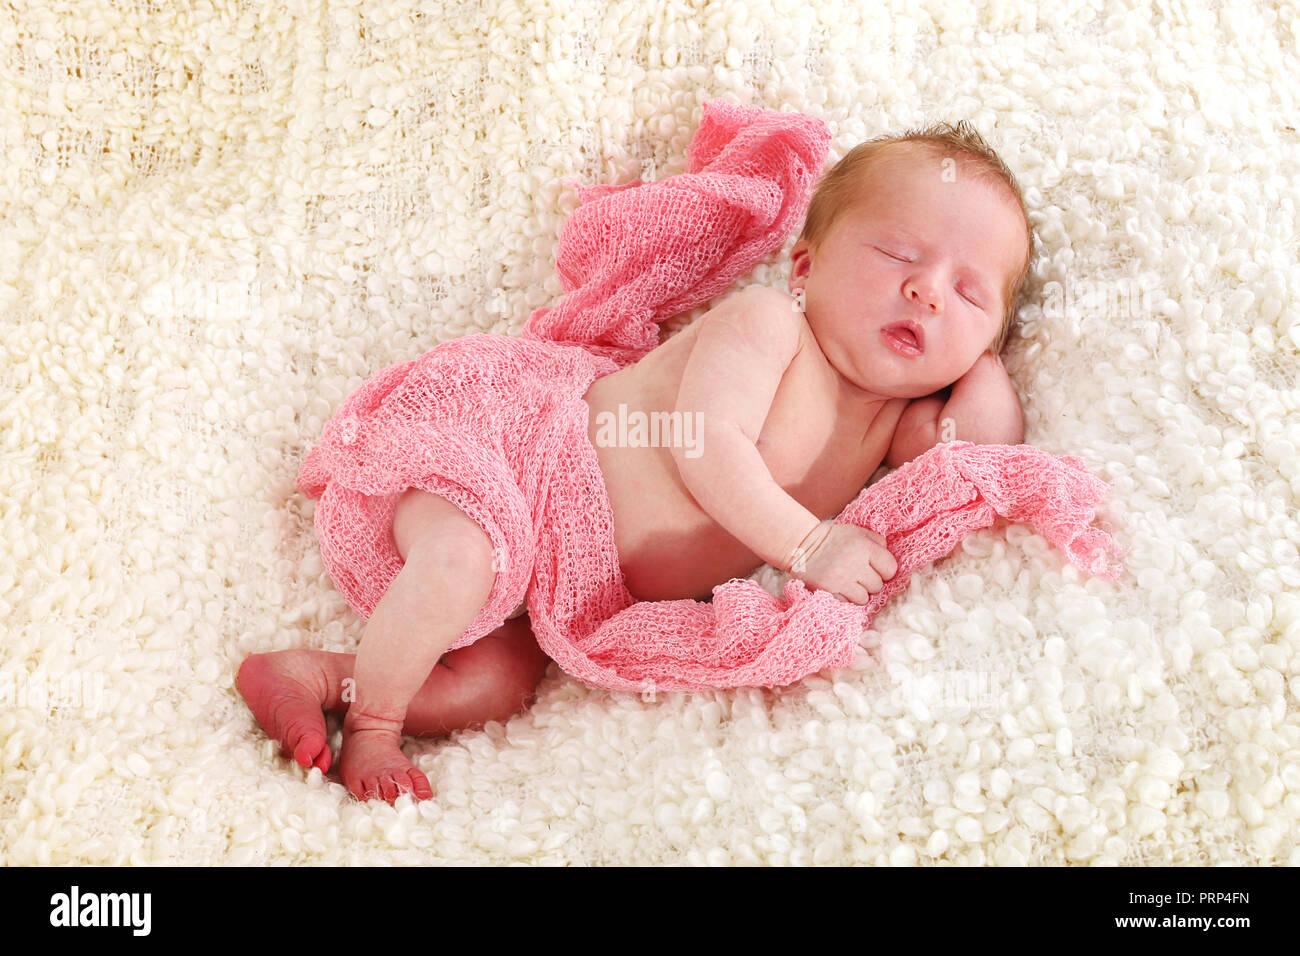 new born baby girl sleeping, 6 days old Stock Photo - Alamy